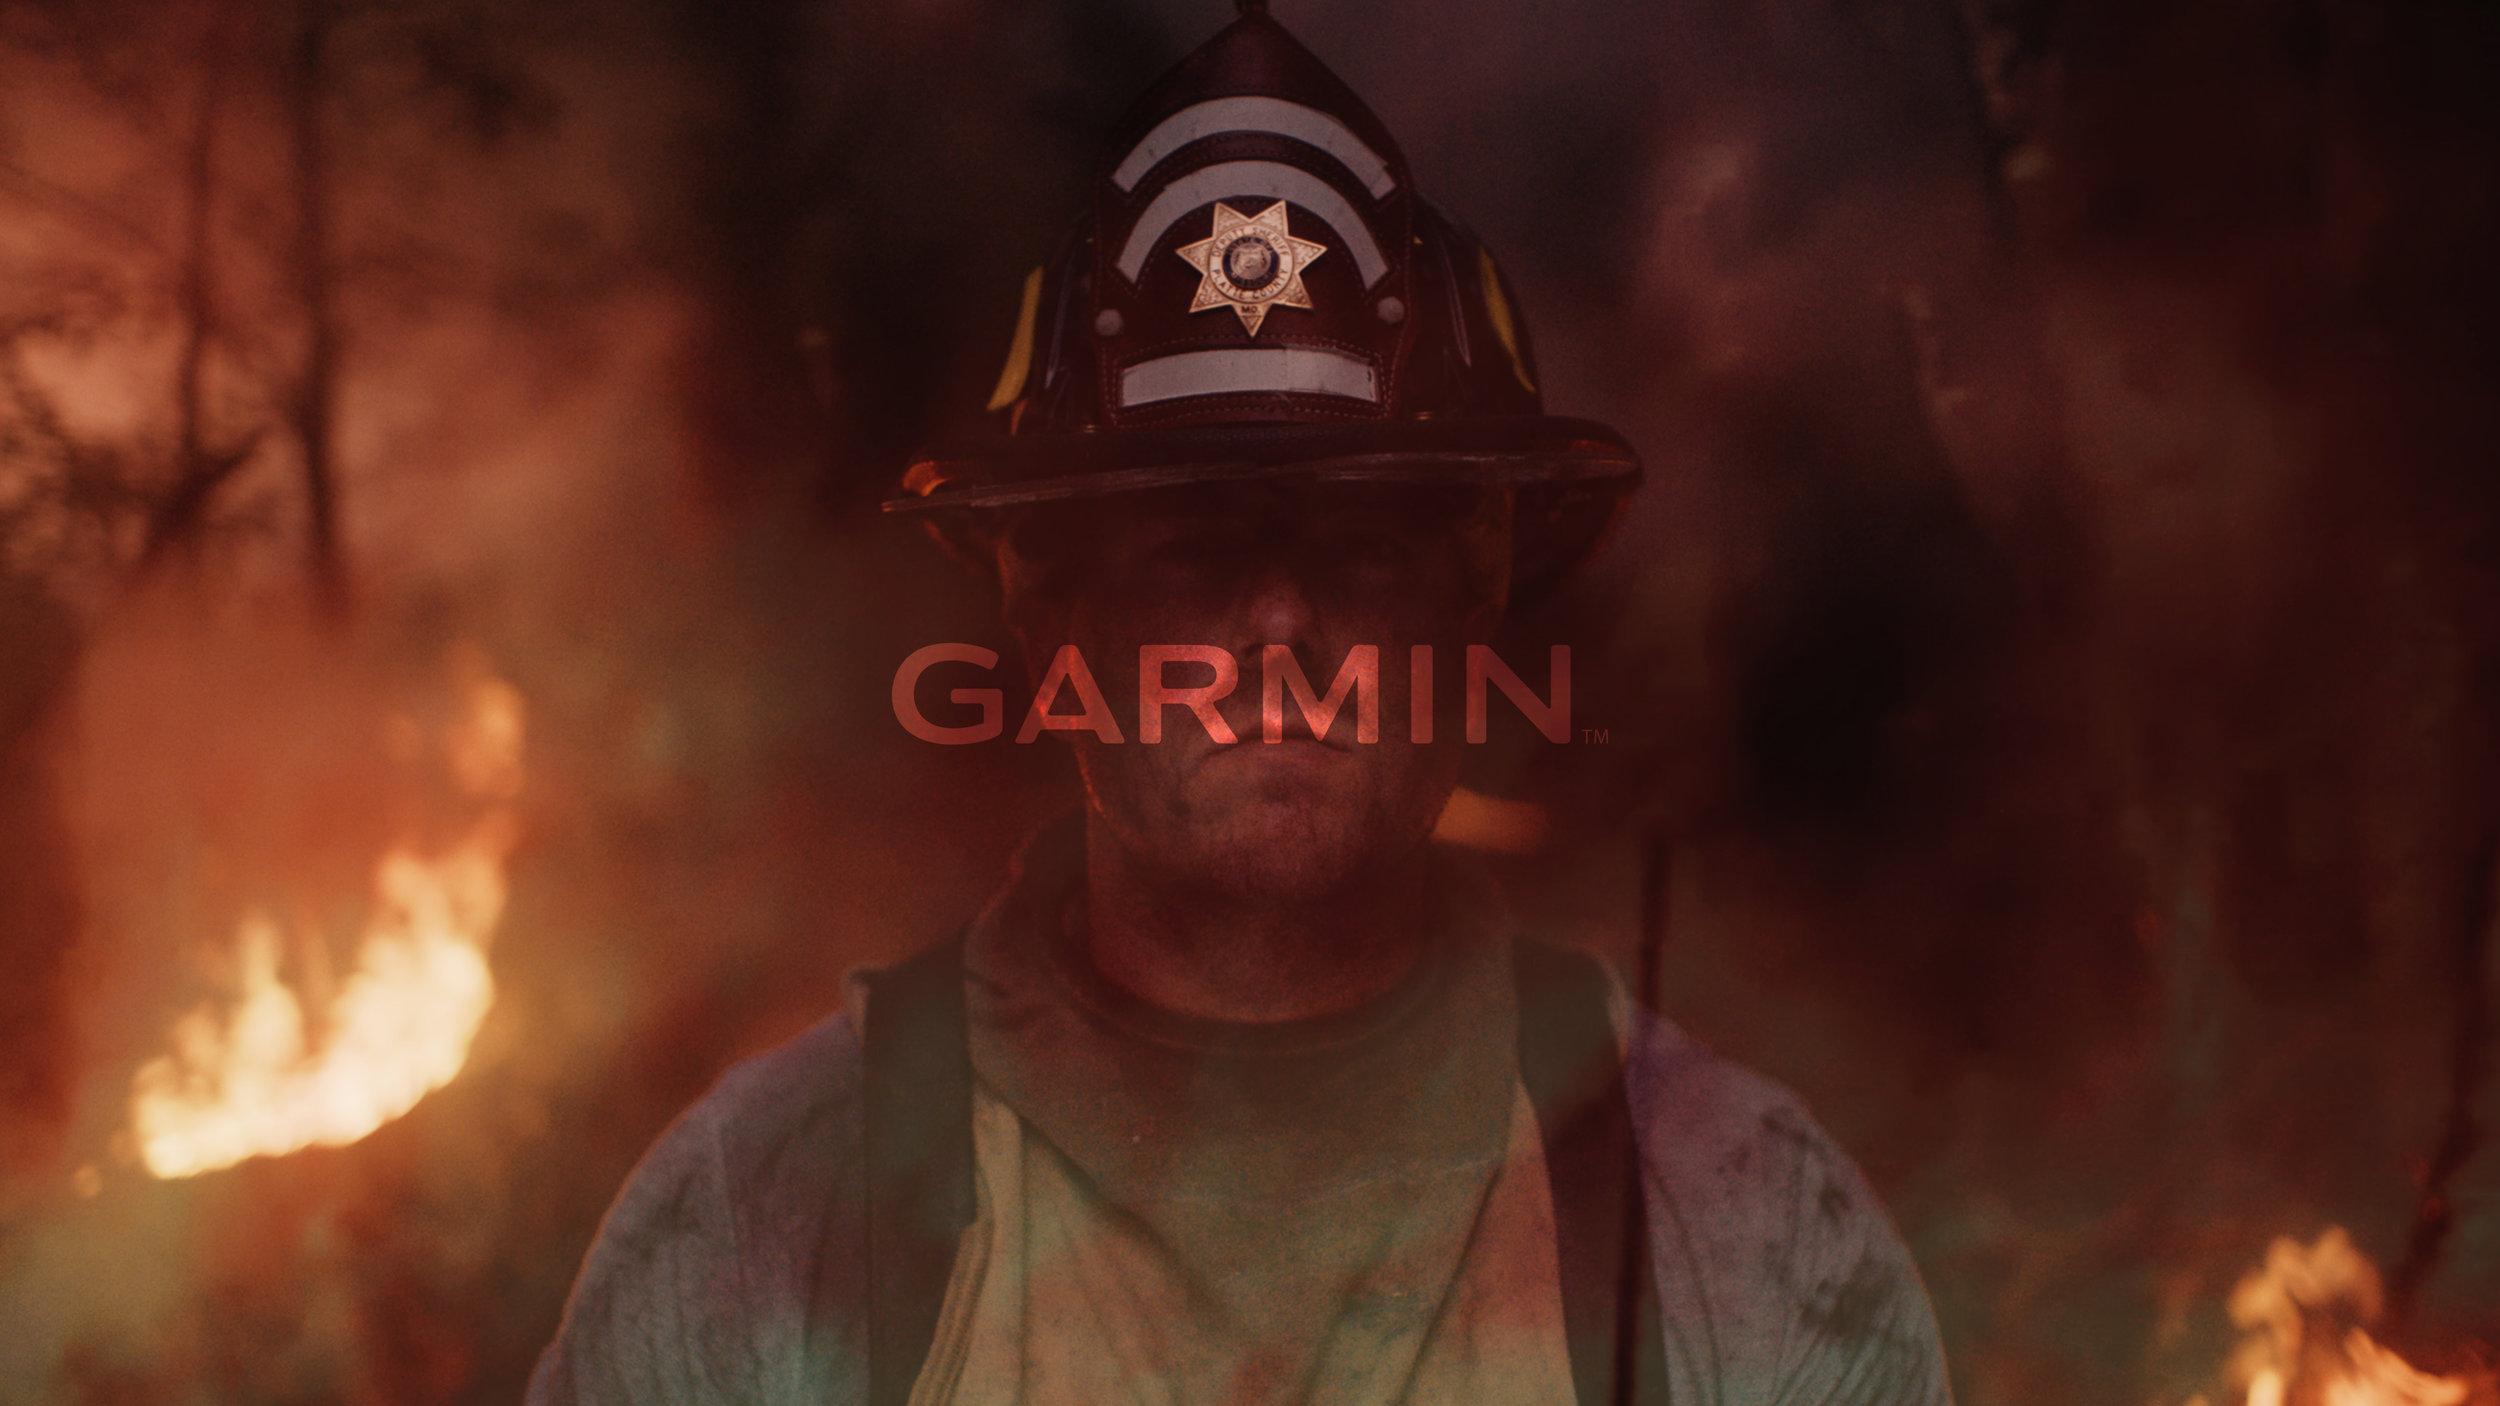 Garmin | Instinct Watch | 60sec Director's Cut